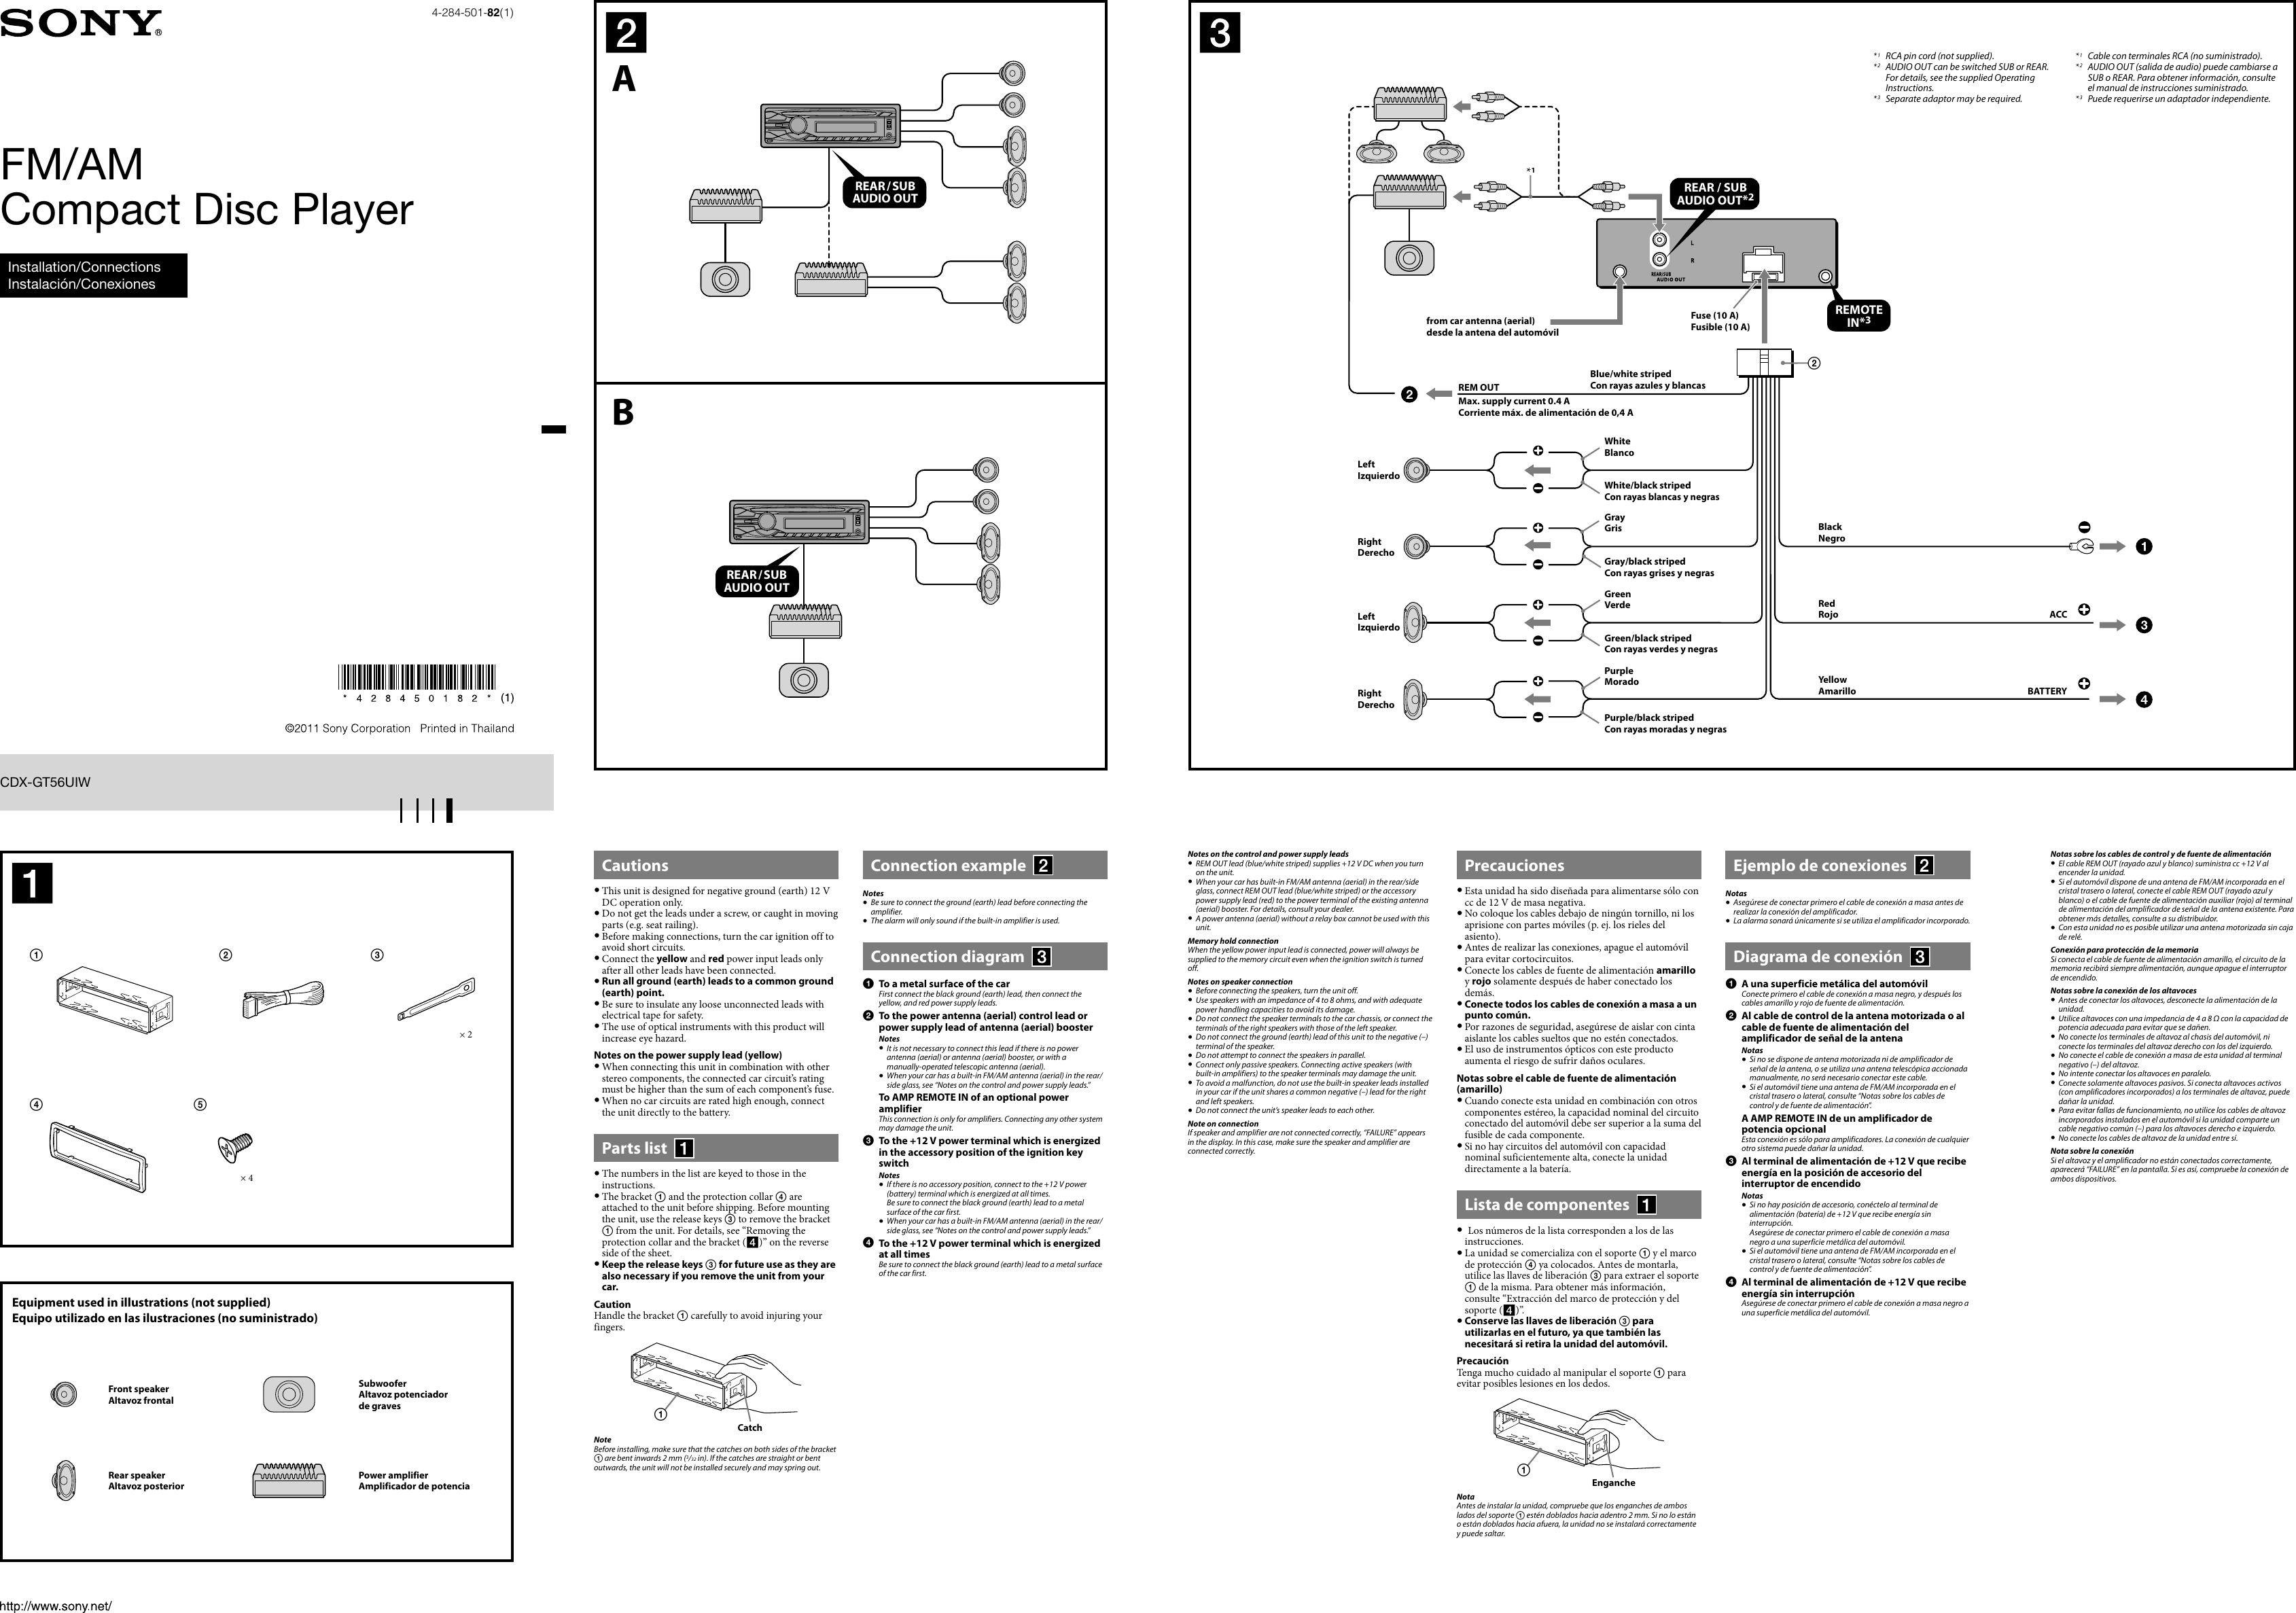 sony cdx gt56uiw wiring diagram - wiring diagram data sony wiring diagram pioneer car stereo wiring diagram 2.rp.tennisabtlg-tus-erfenbach.de